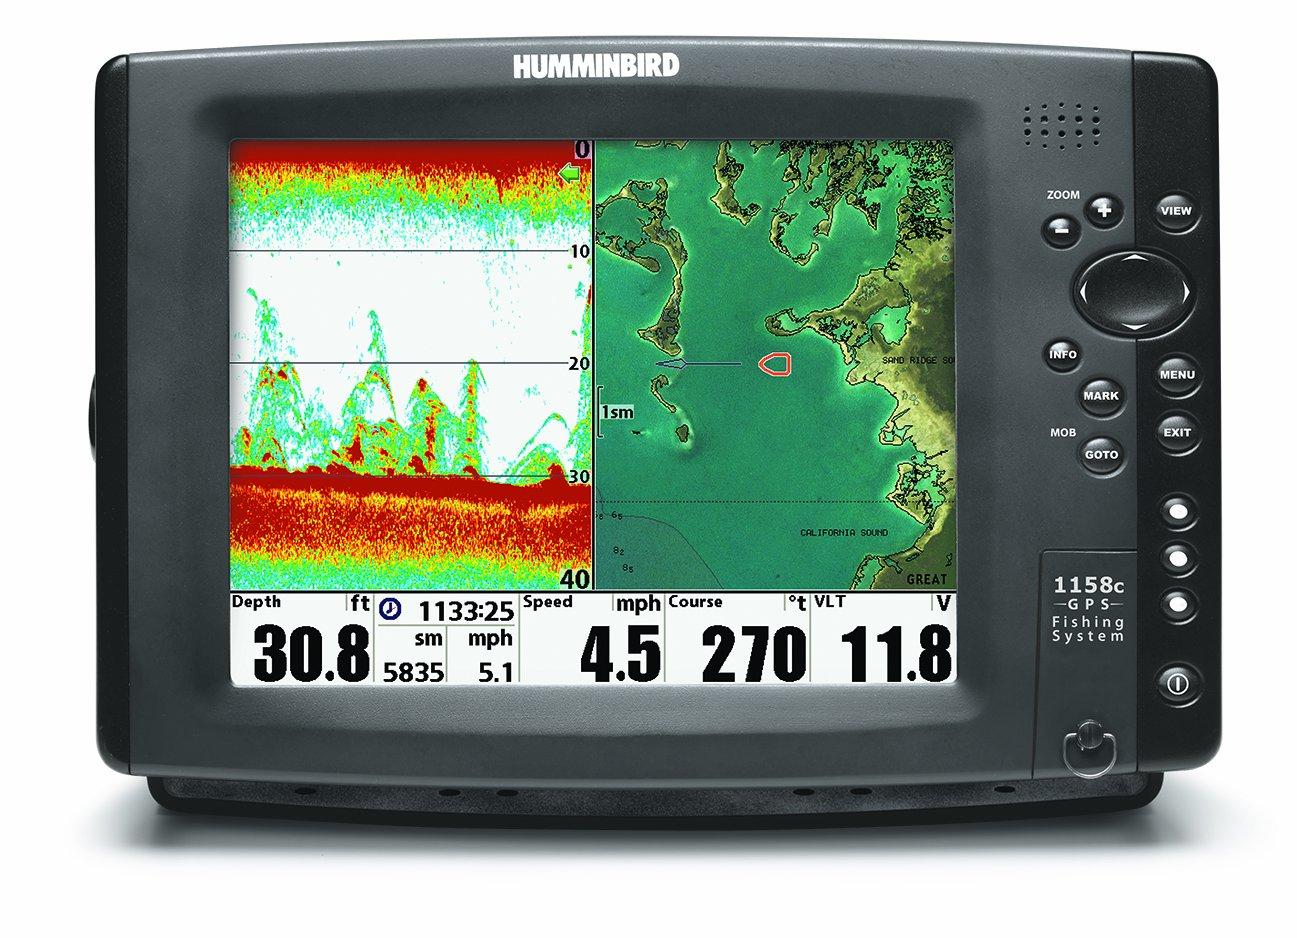 garmin gps 441s wiring diagram wiring libraryamazon com humminbird 407980 1 1158c combo fishfinder and gps (discontinued by